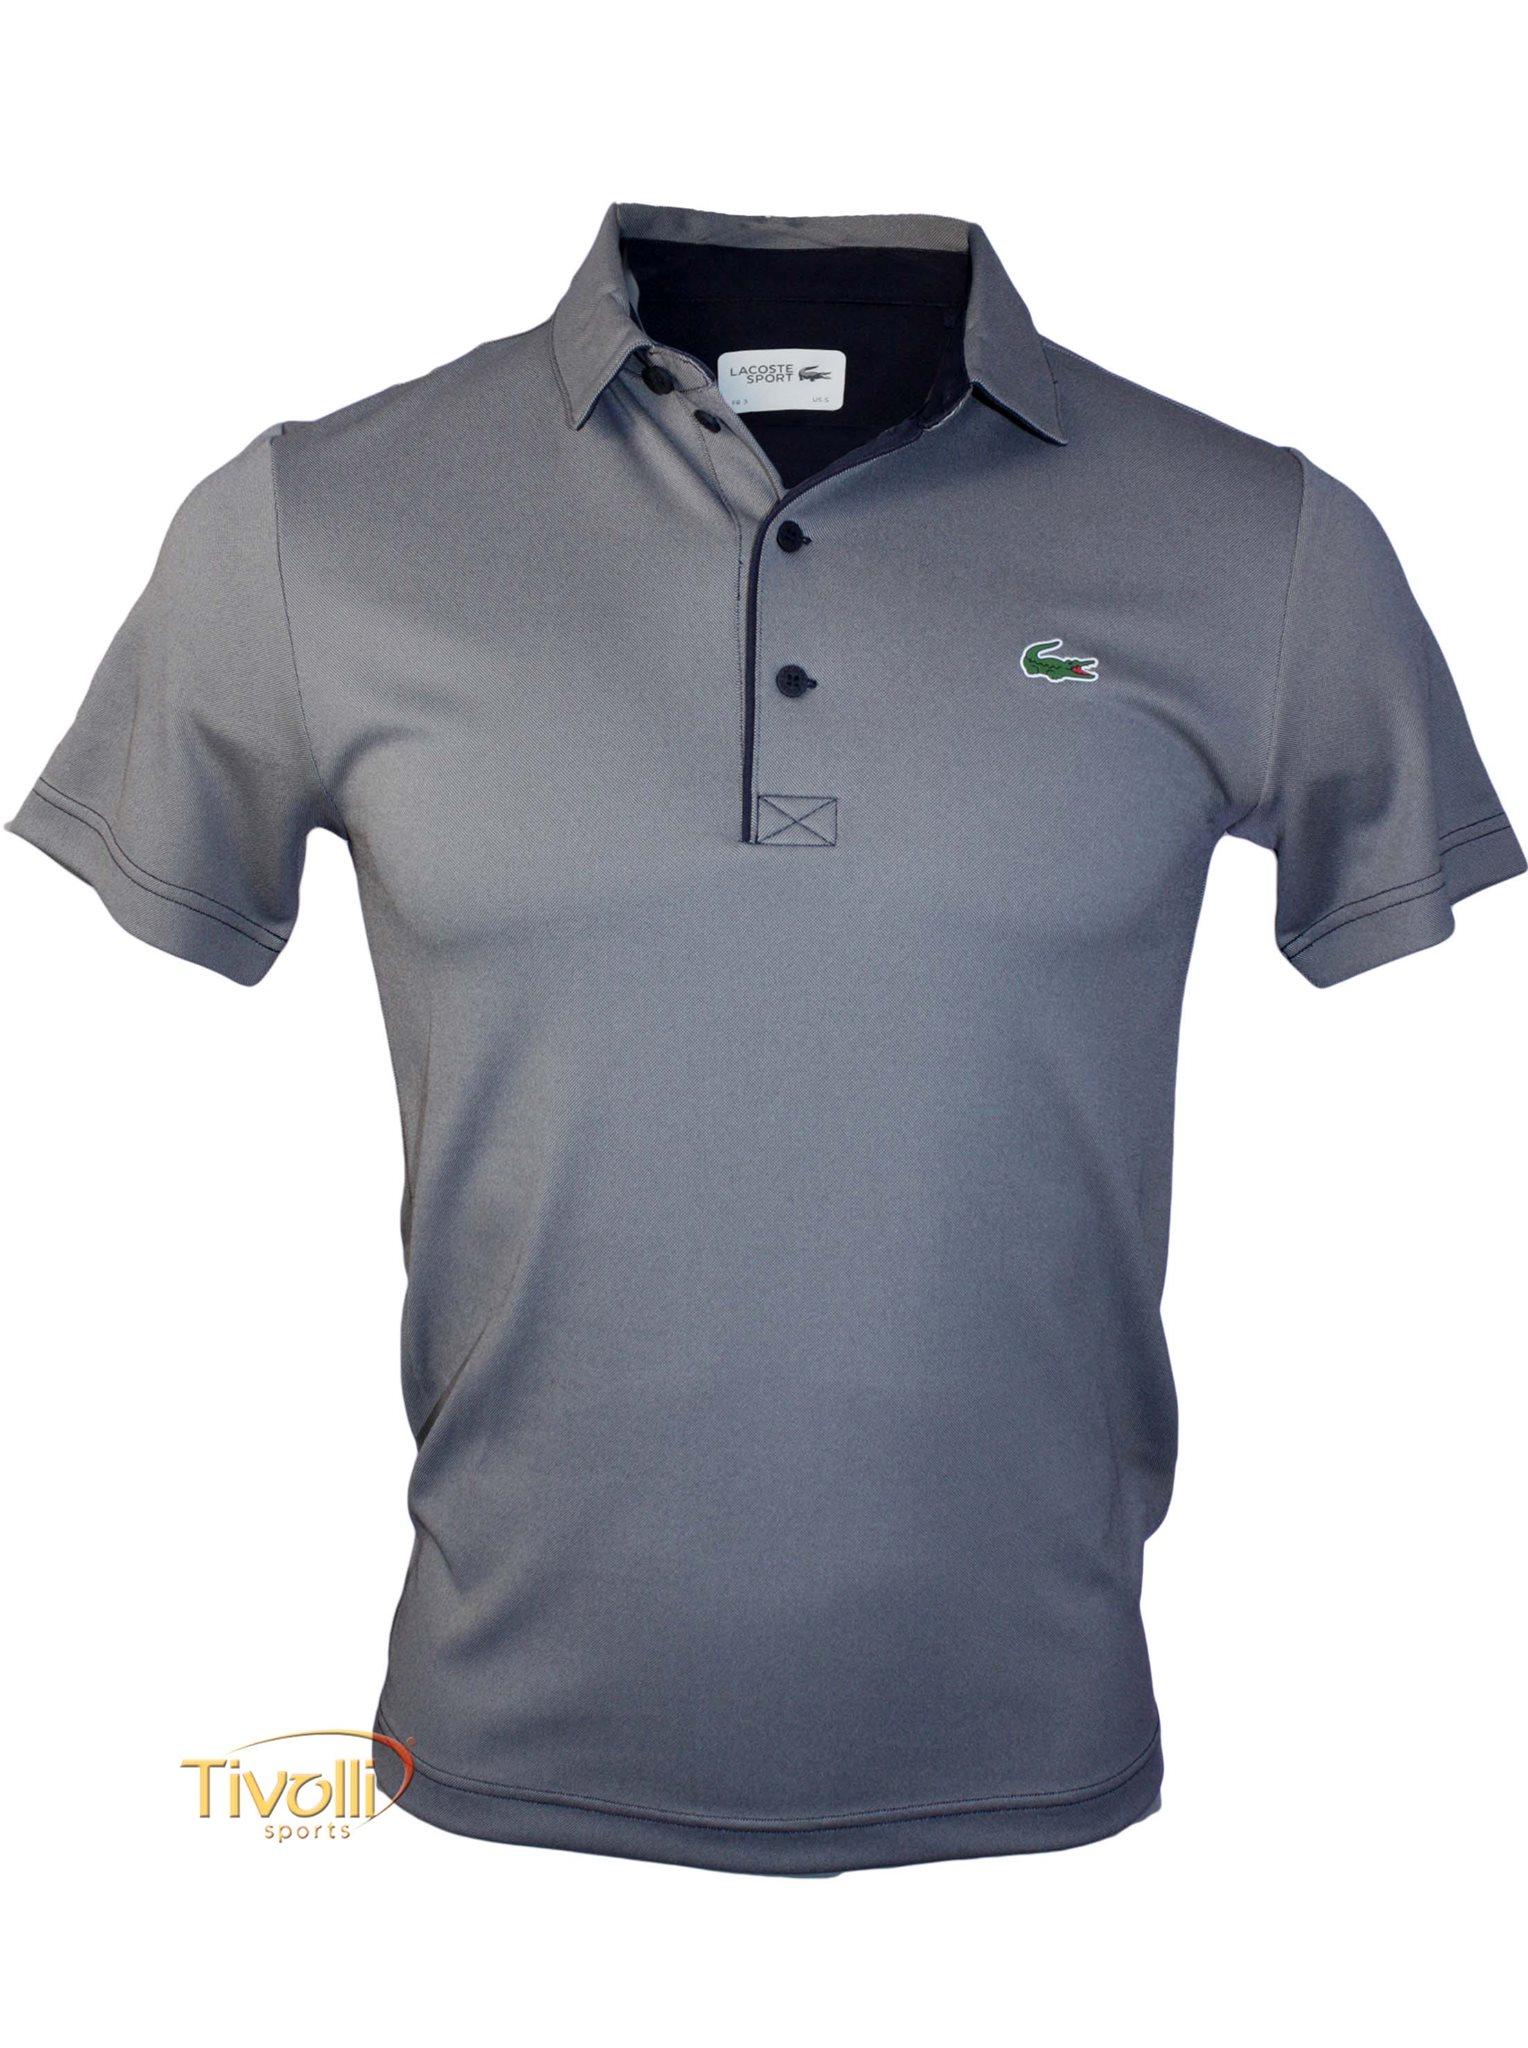 c4c516a32ee3d ... Camisa Polo Lacoste Sport Ultra Dry masculina cinza e azul marinho  f5466fe2b3fbe5 ...